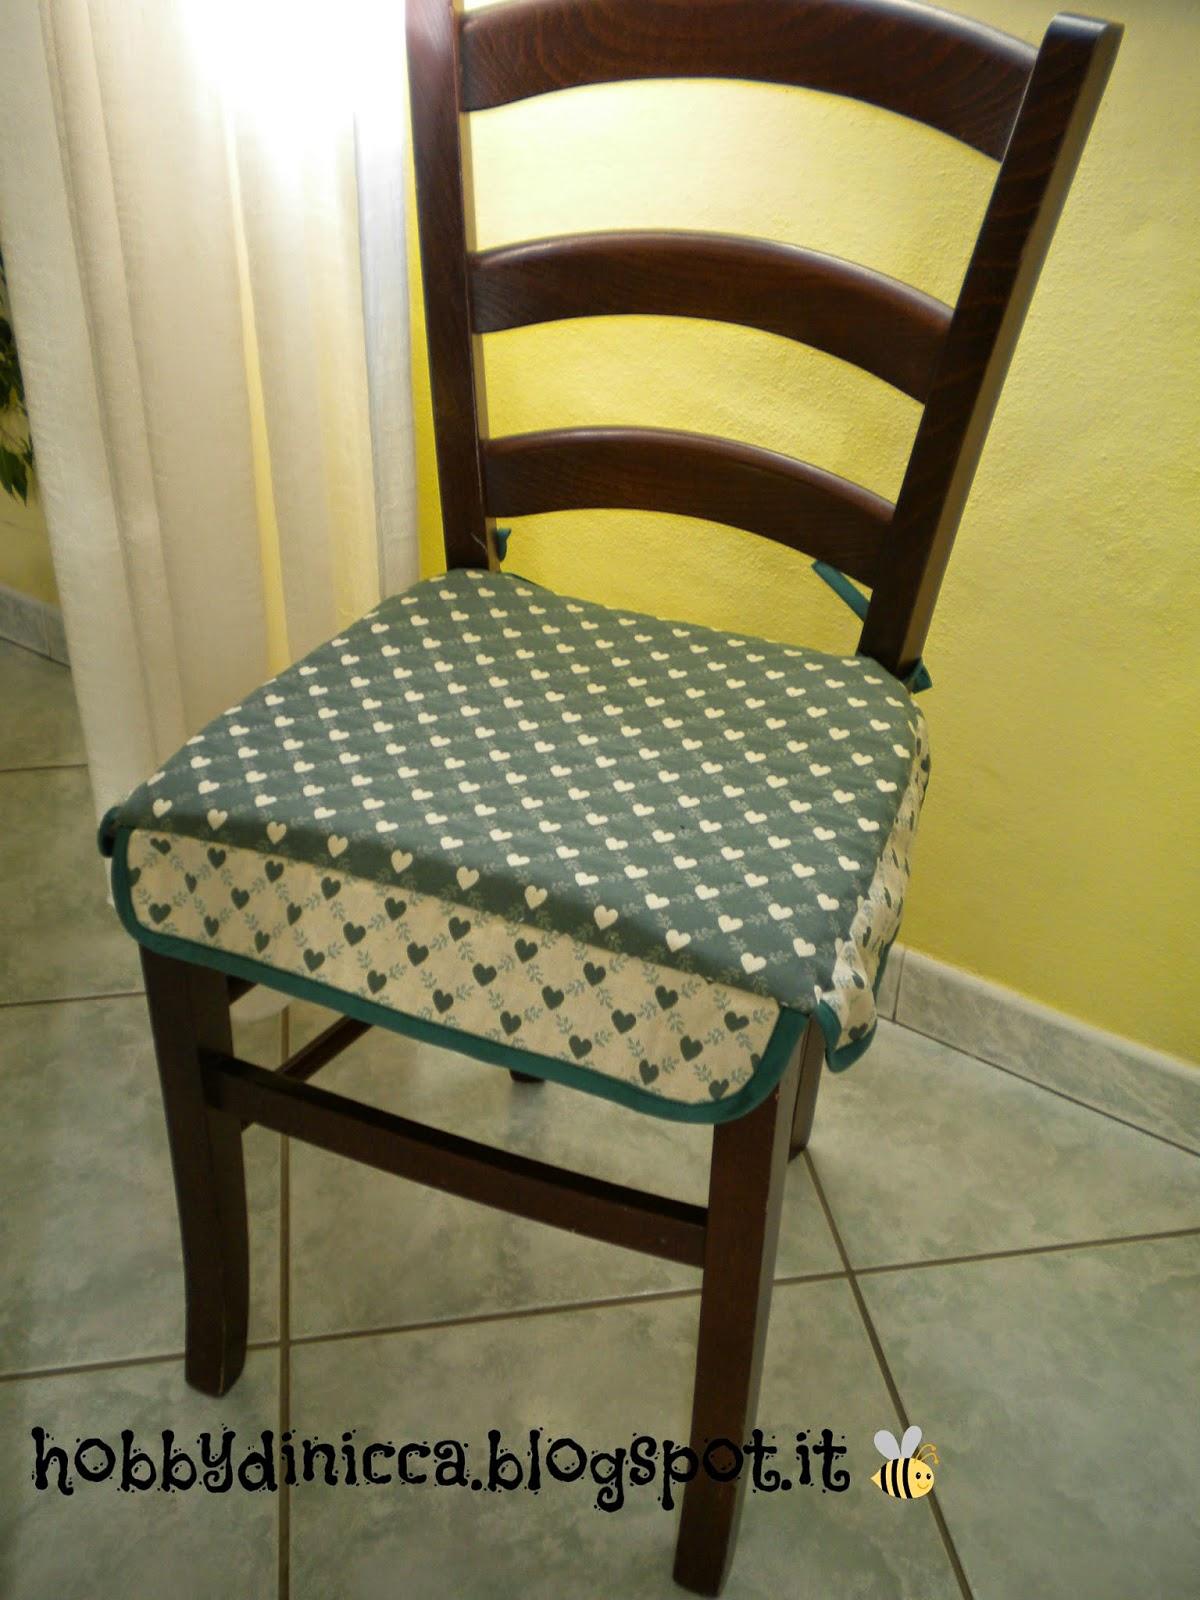 Cuscino per sedie Tutorial - Hobbydinicca